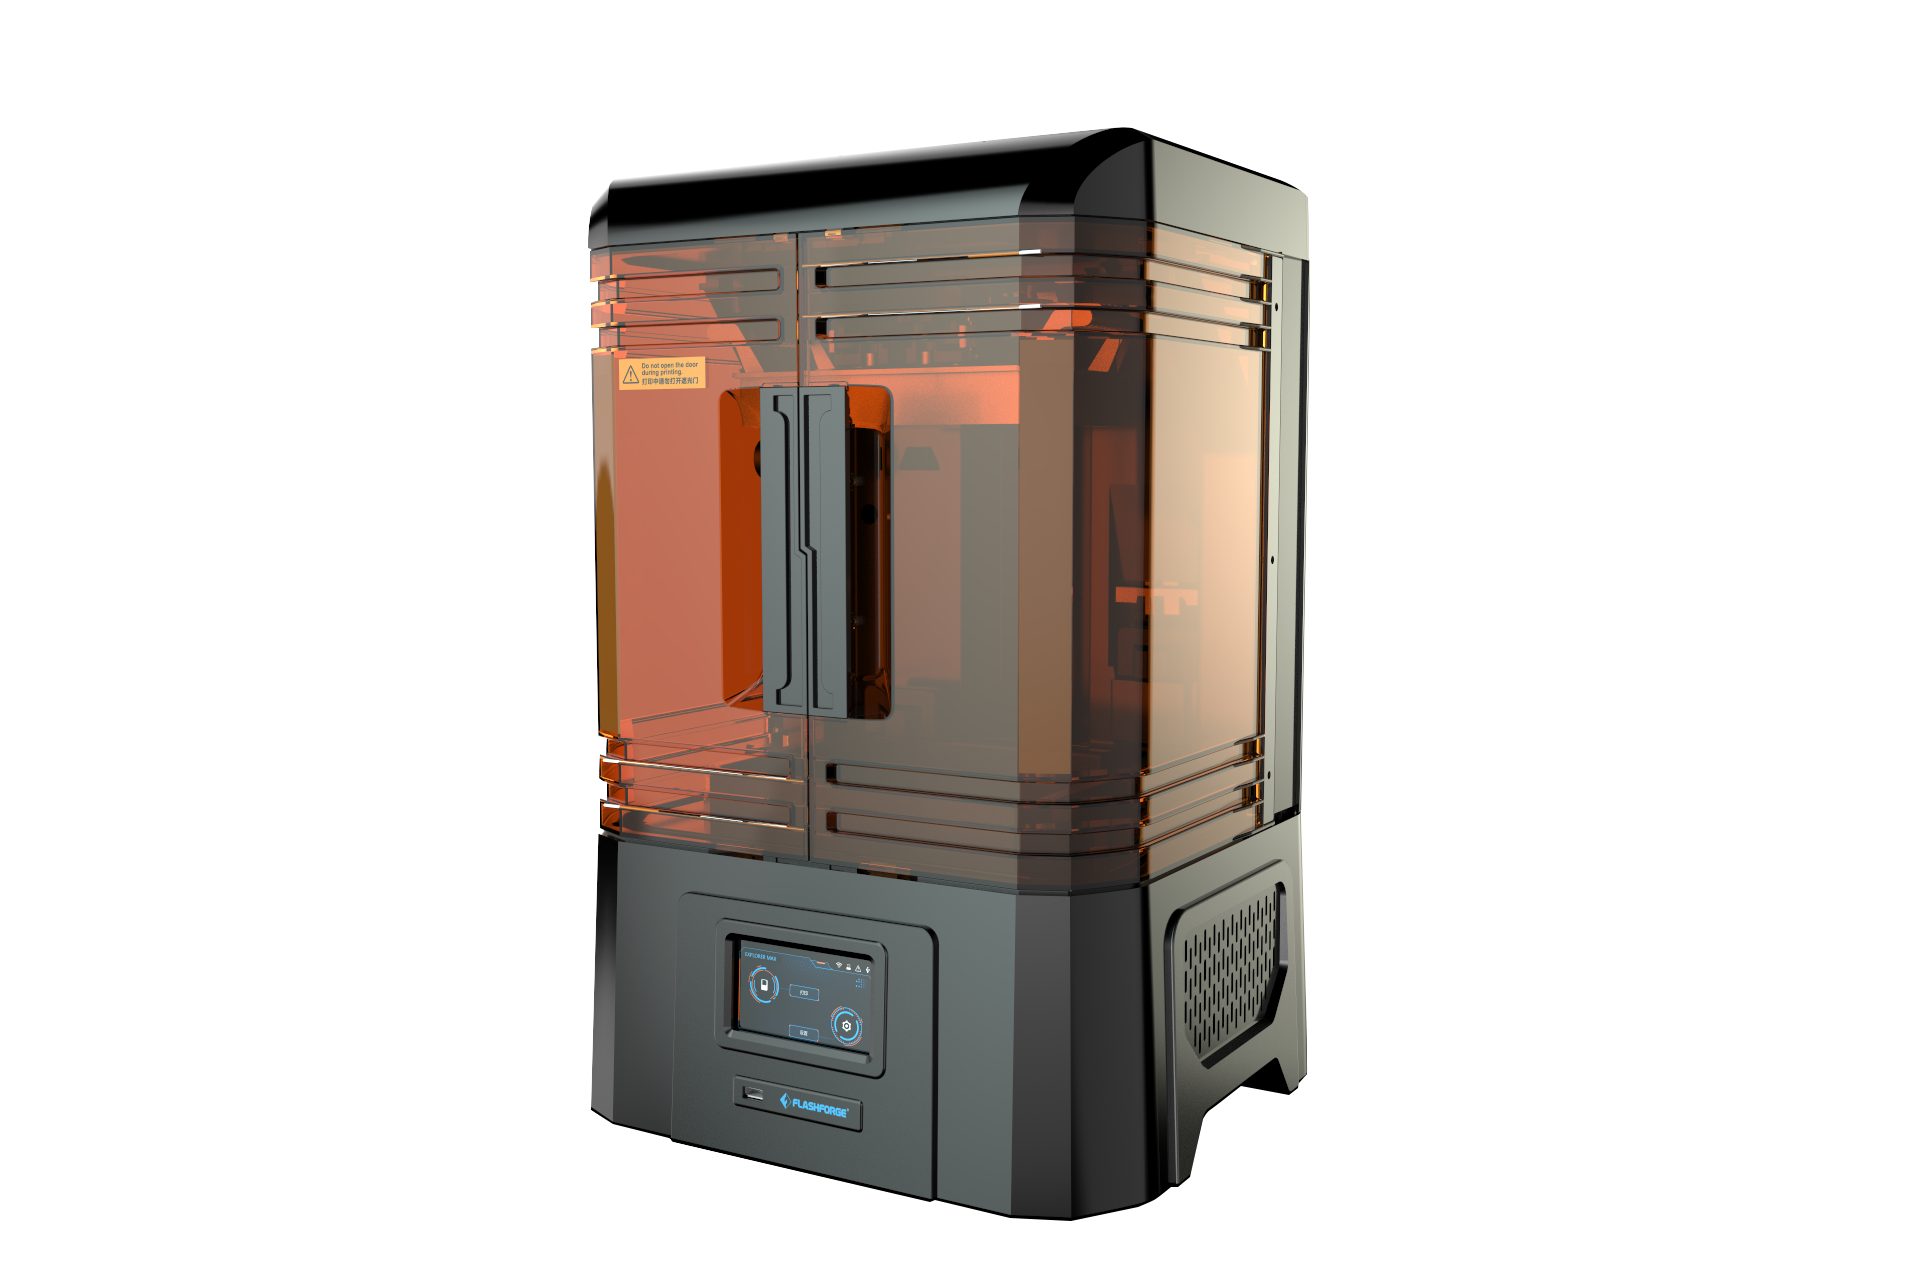 Flashforge Explorer Max – Pre-order